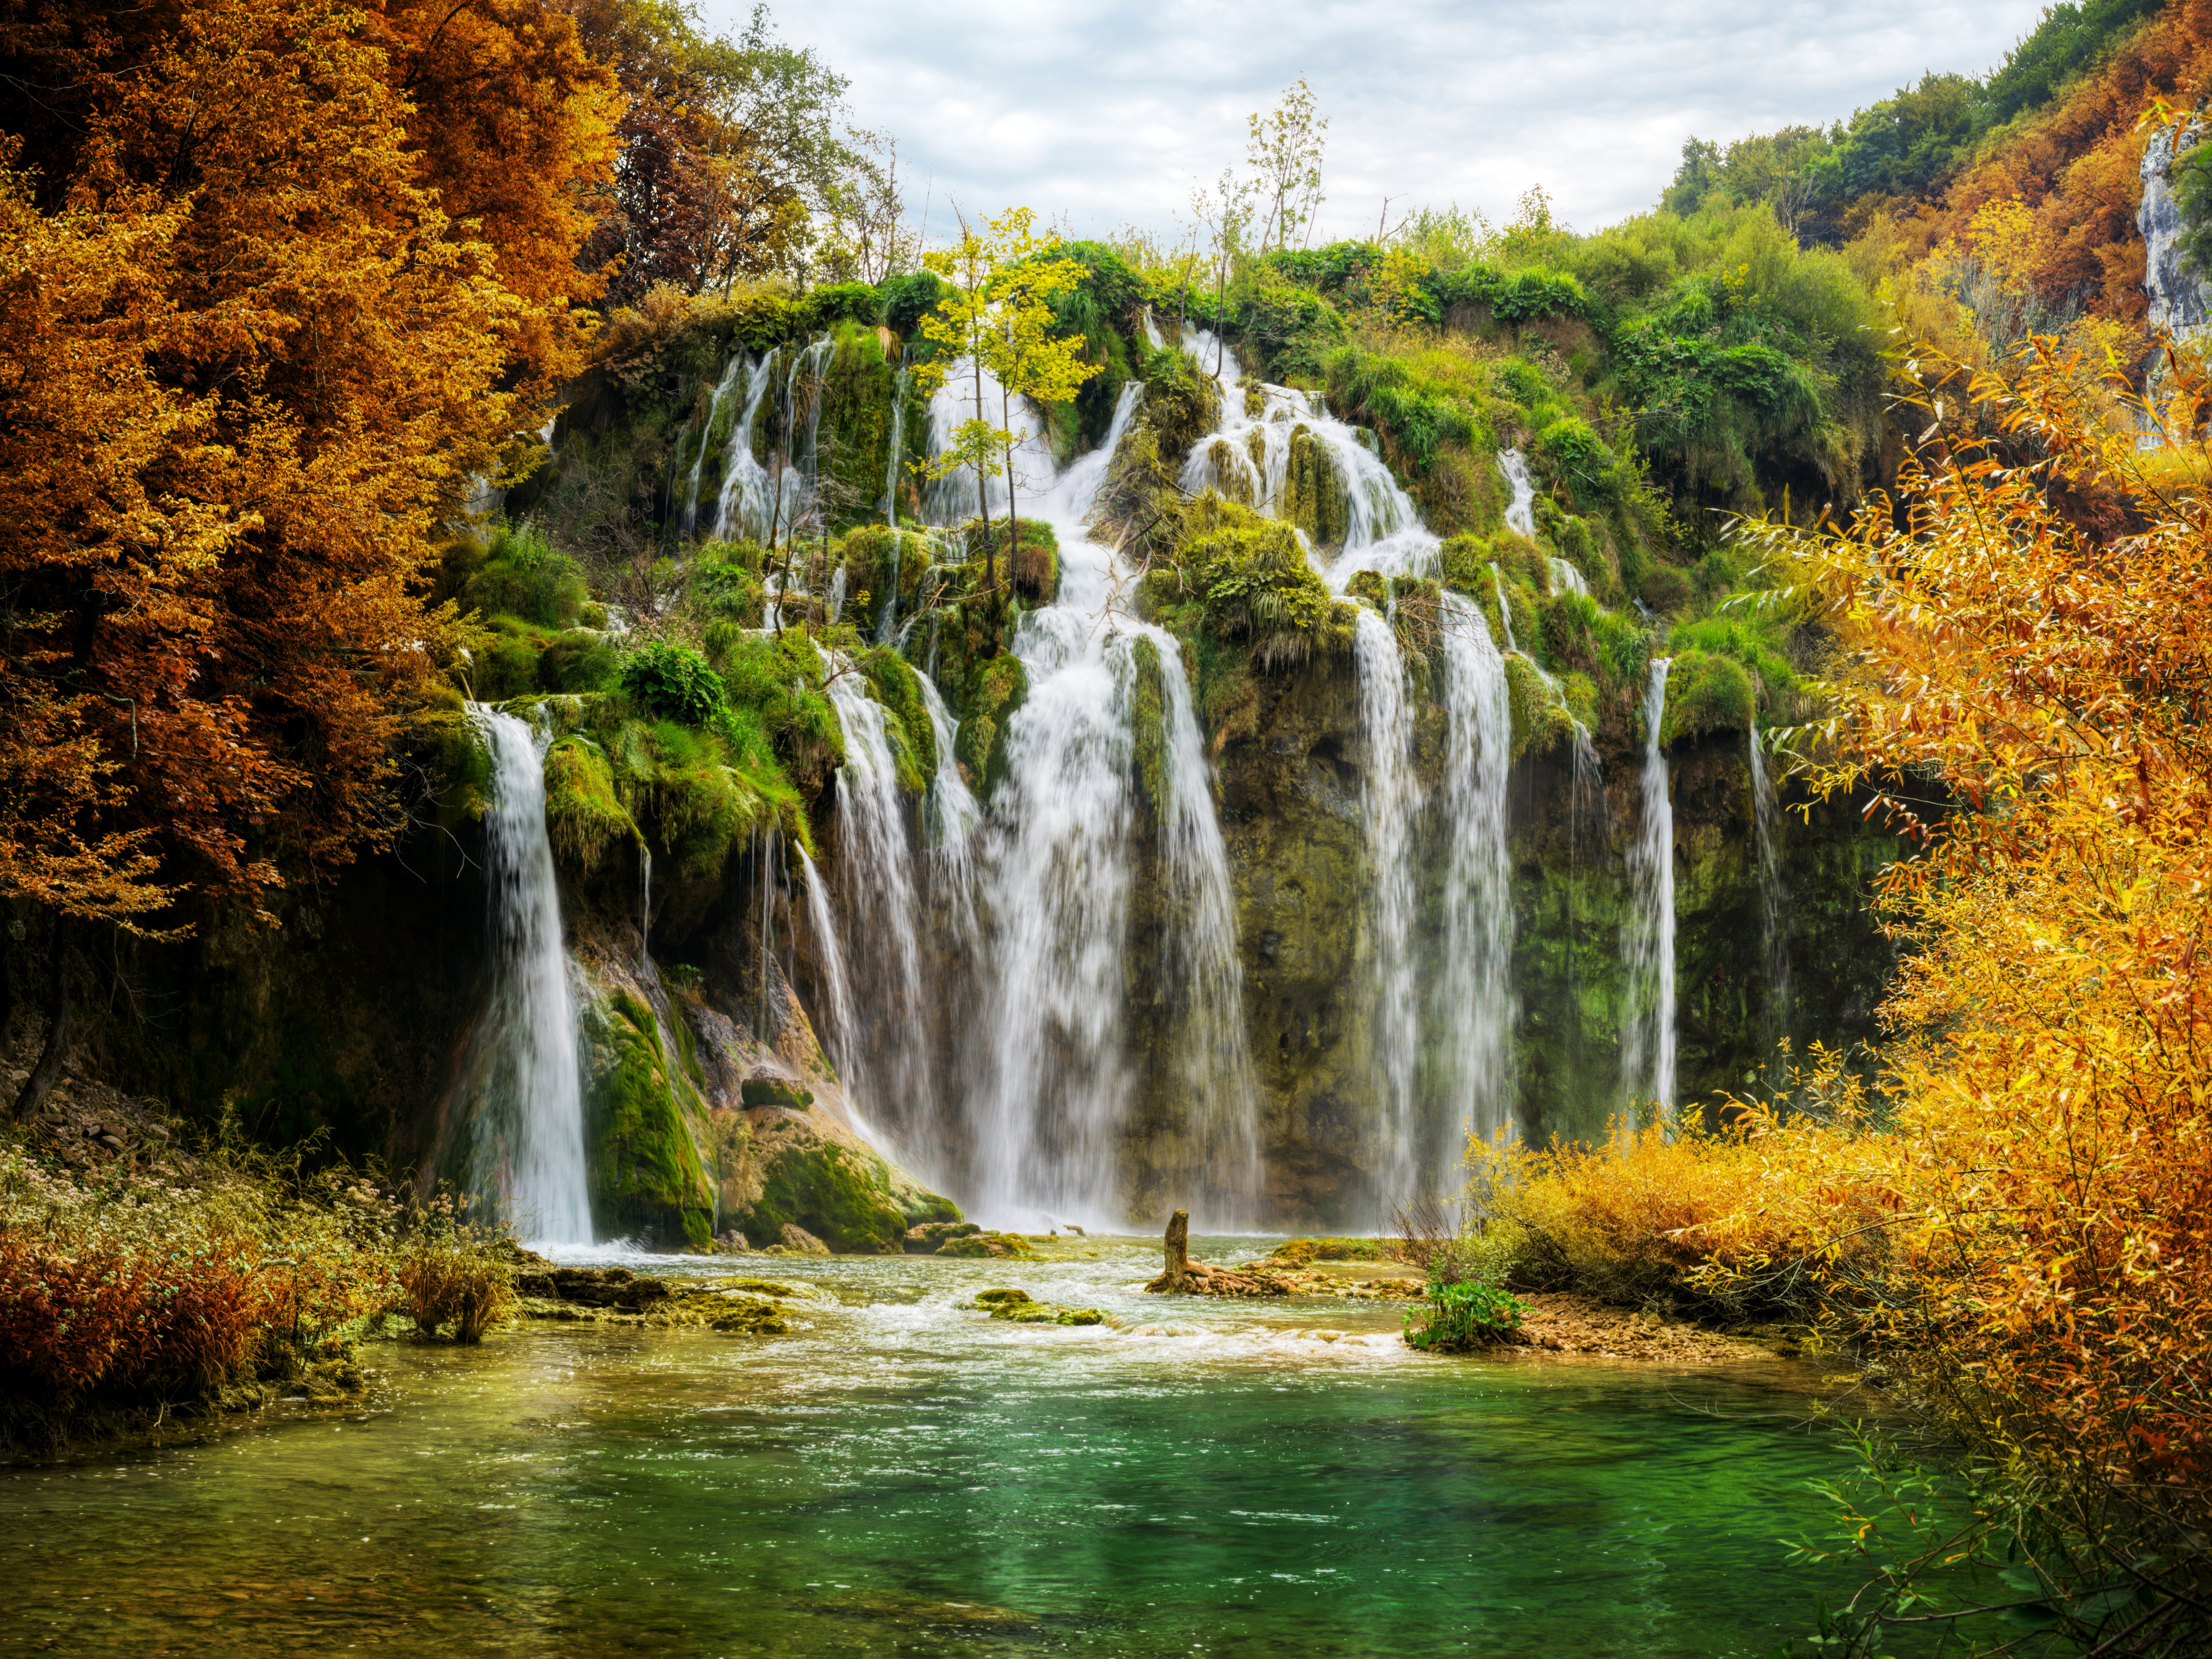 Forest Waterfall 5k Retina Ultra Hd ţ�纸 And ȃ�景 5616x4212